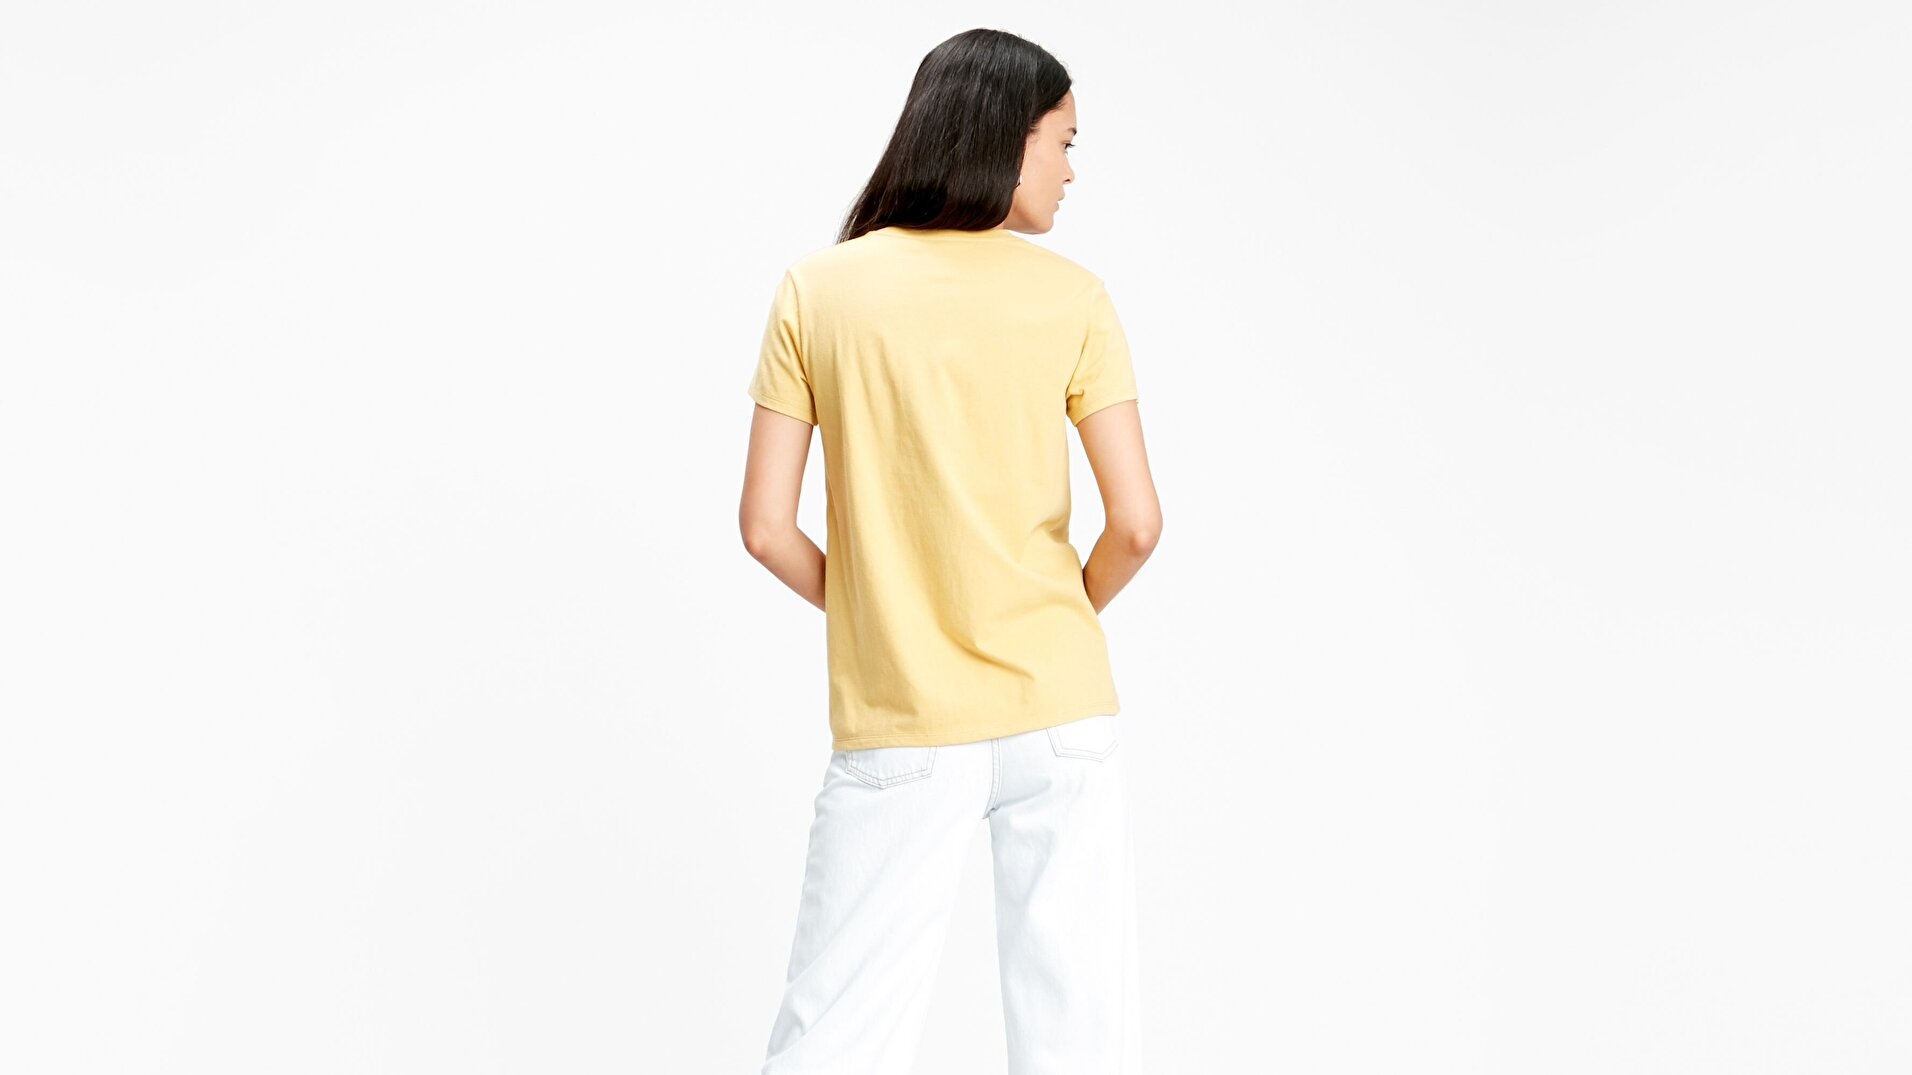 The Perfect Tee Bw T2 Sarı Kadın Tişört